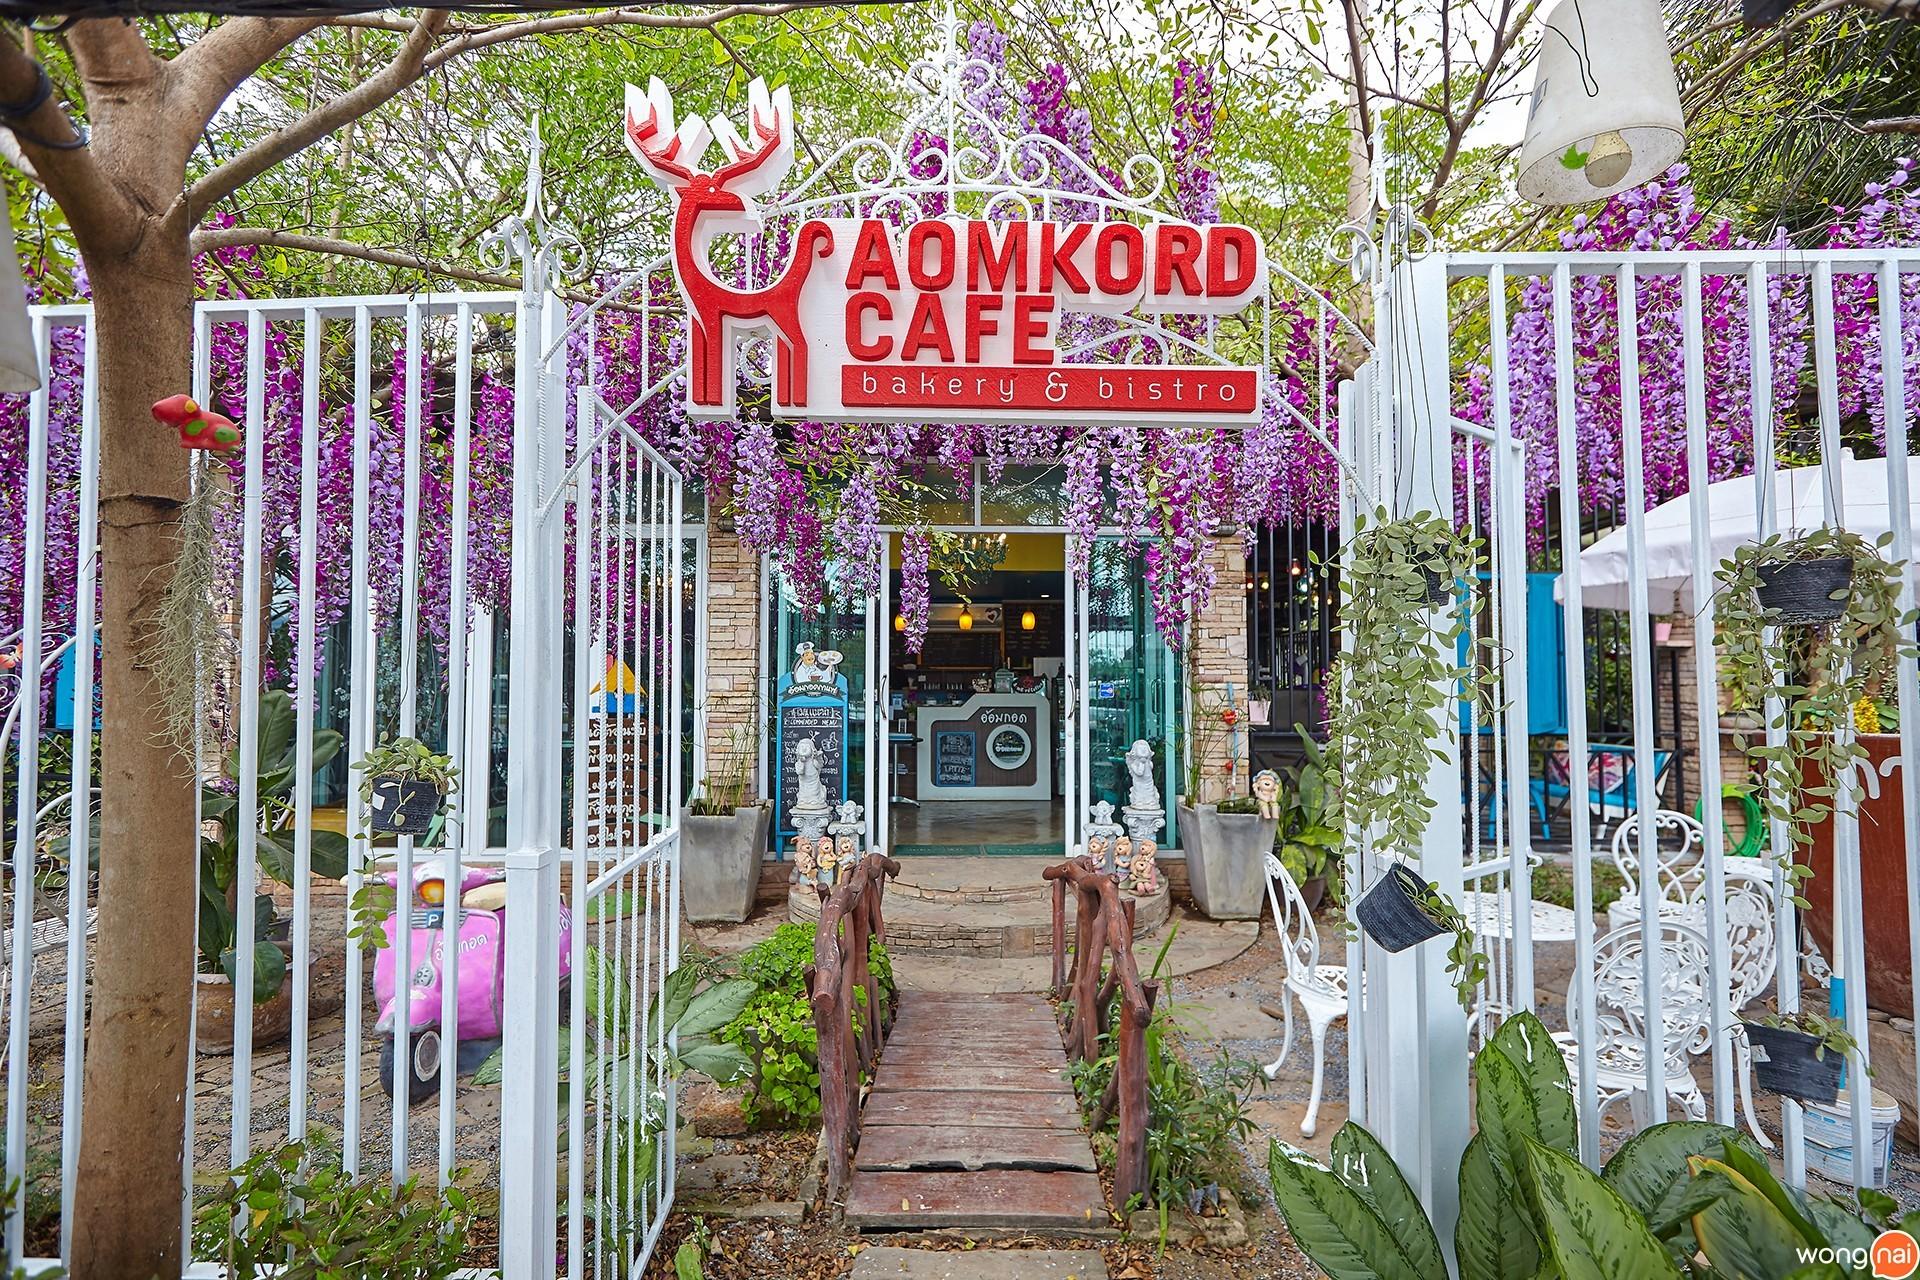 Aomkord Cafe